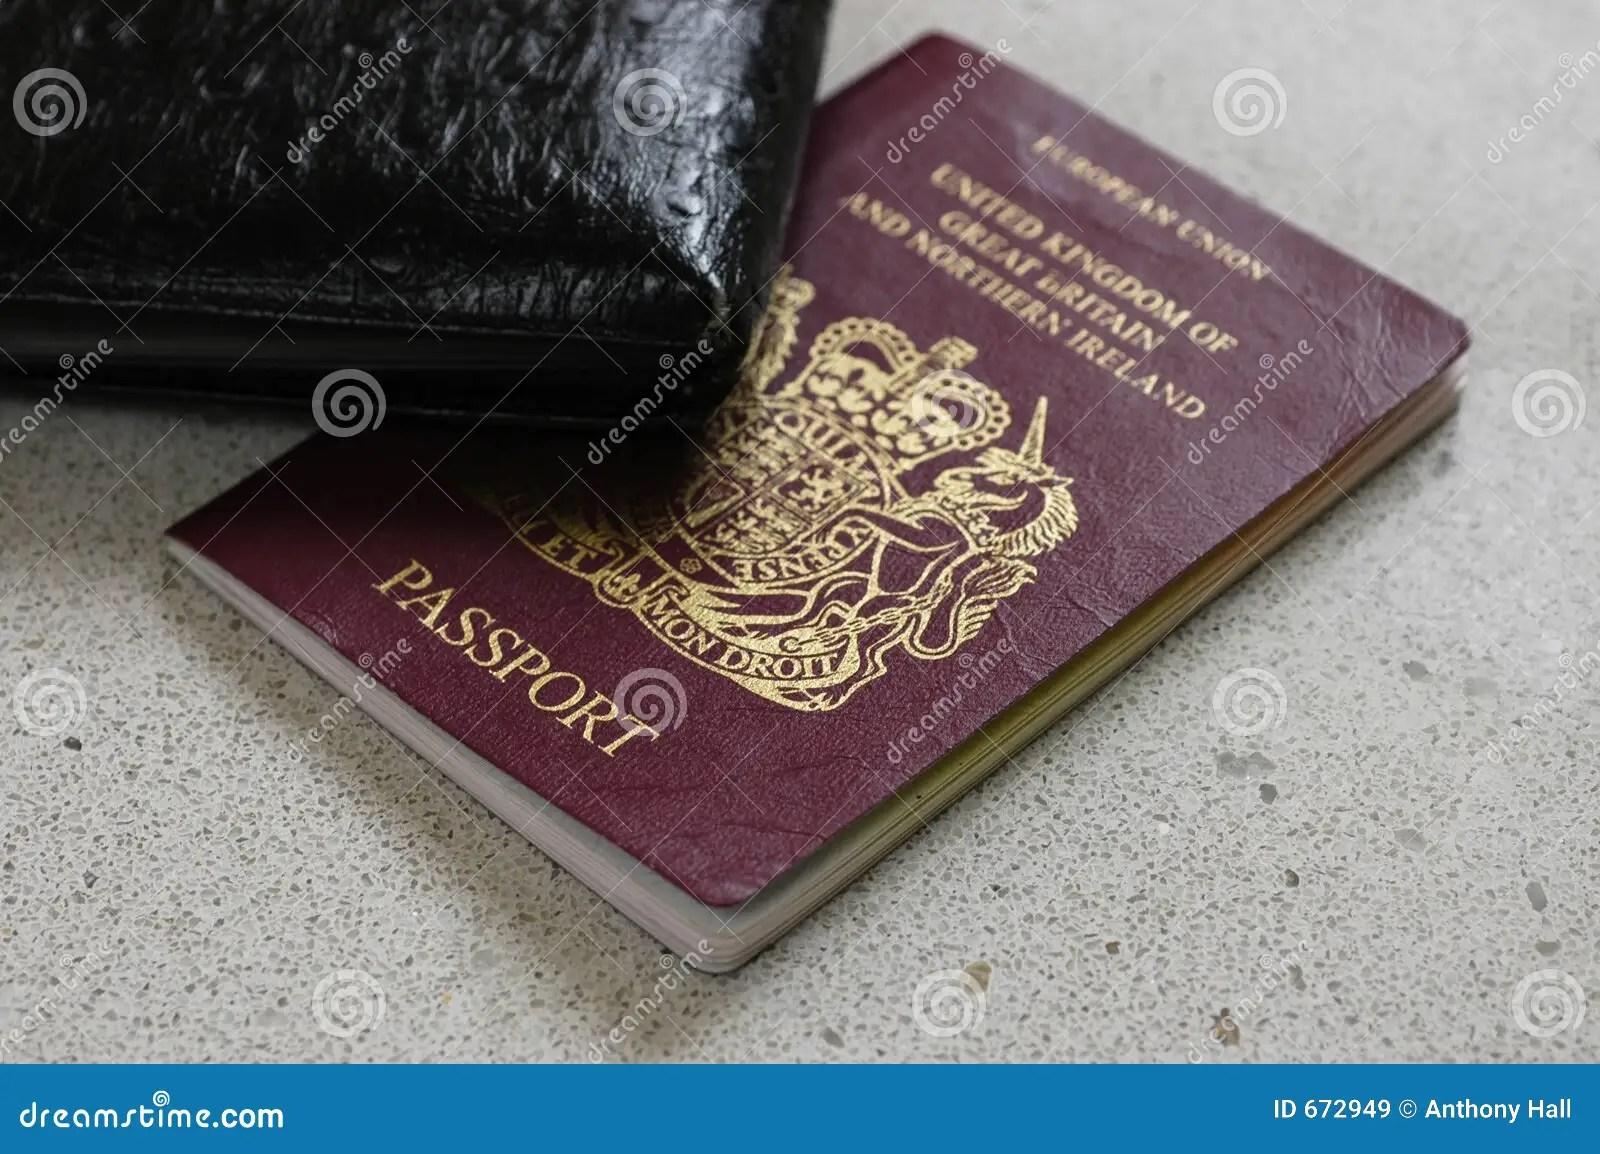 https www dreamstime com royalty free stock images british passport image672949